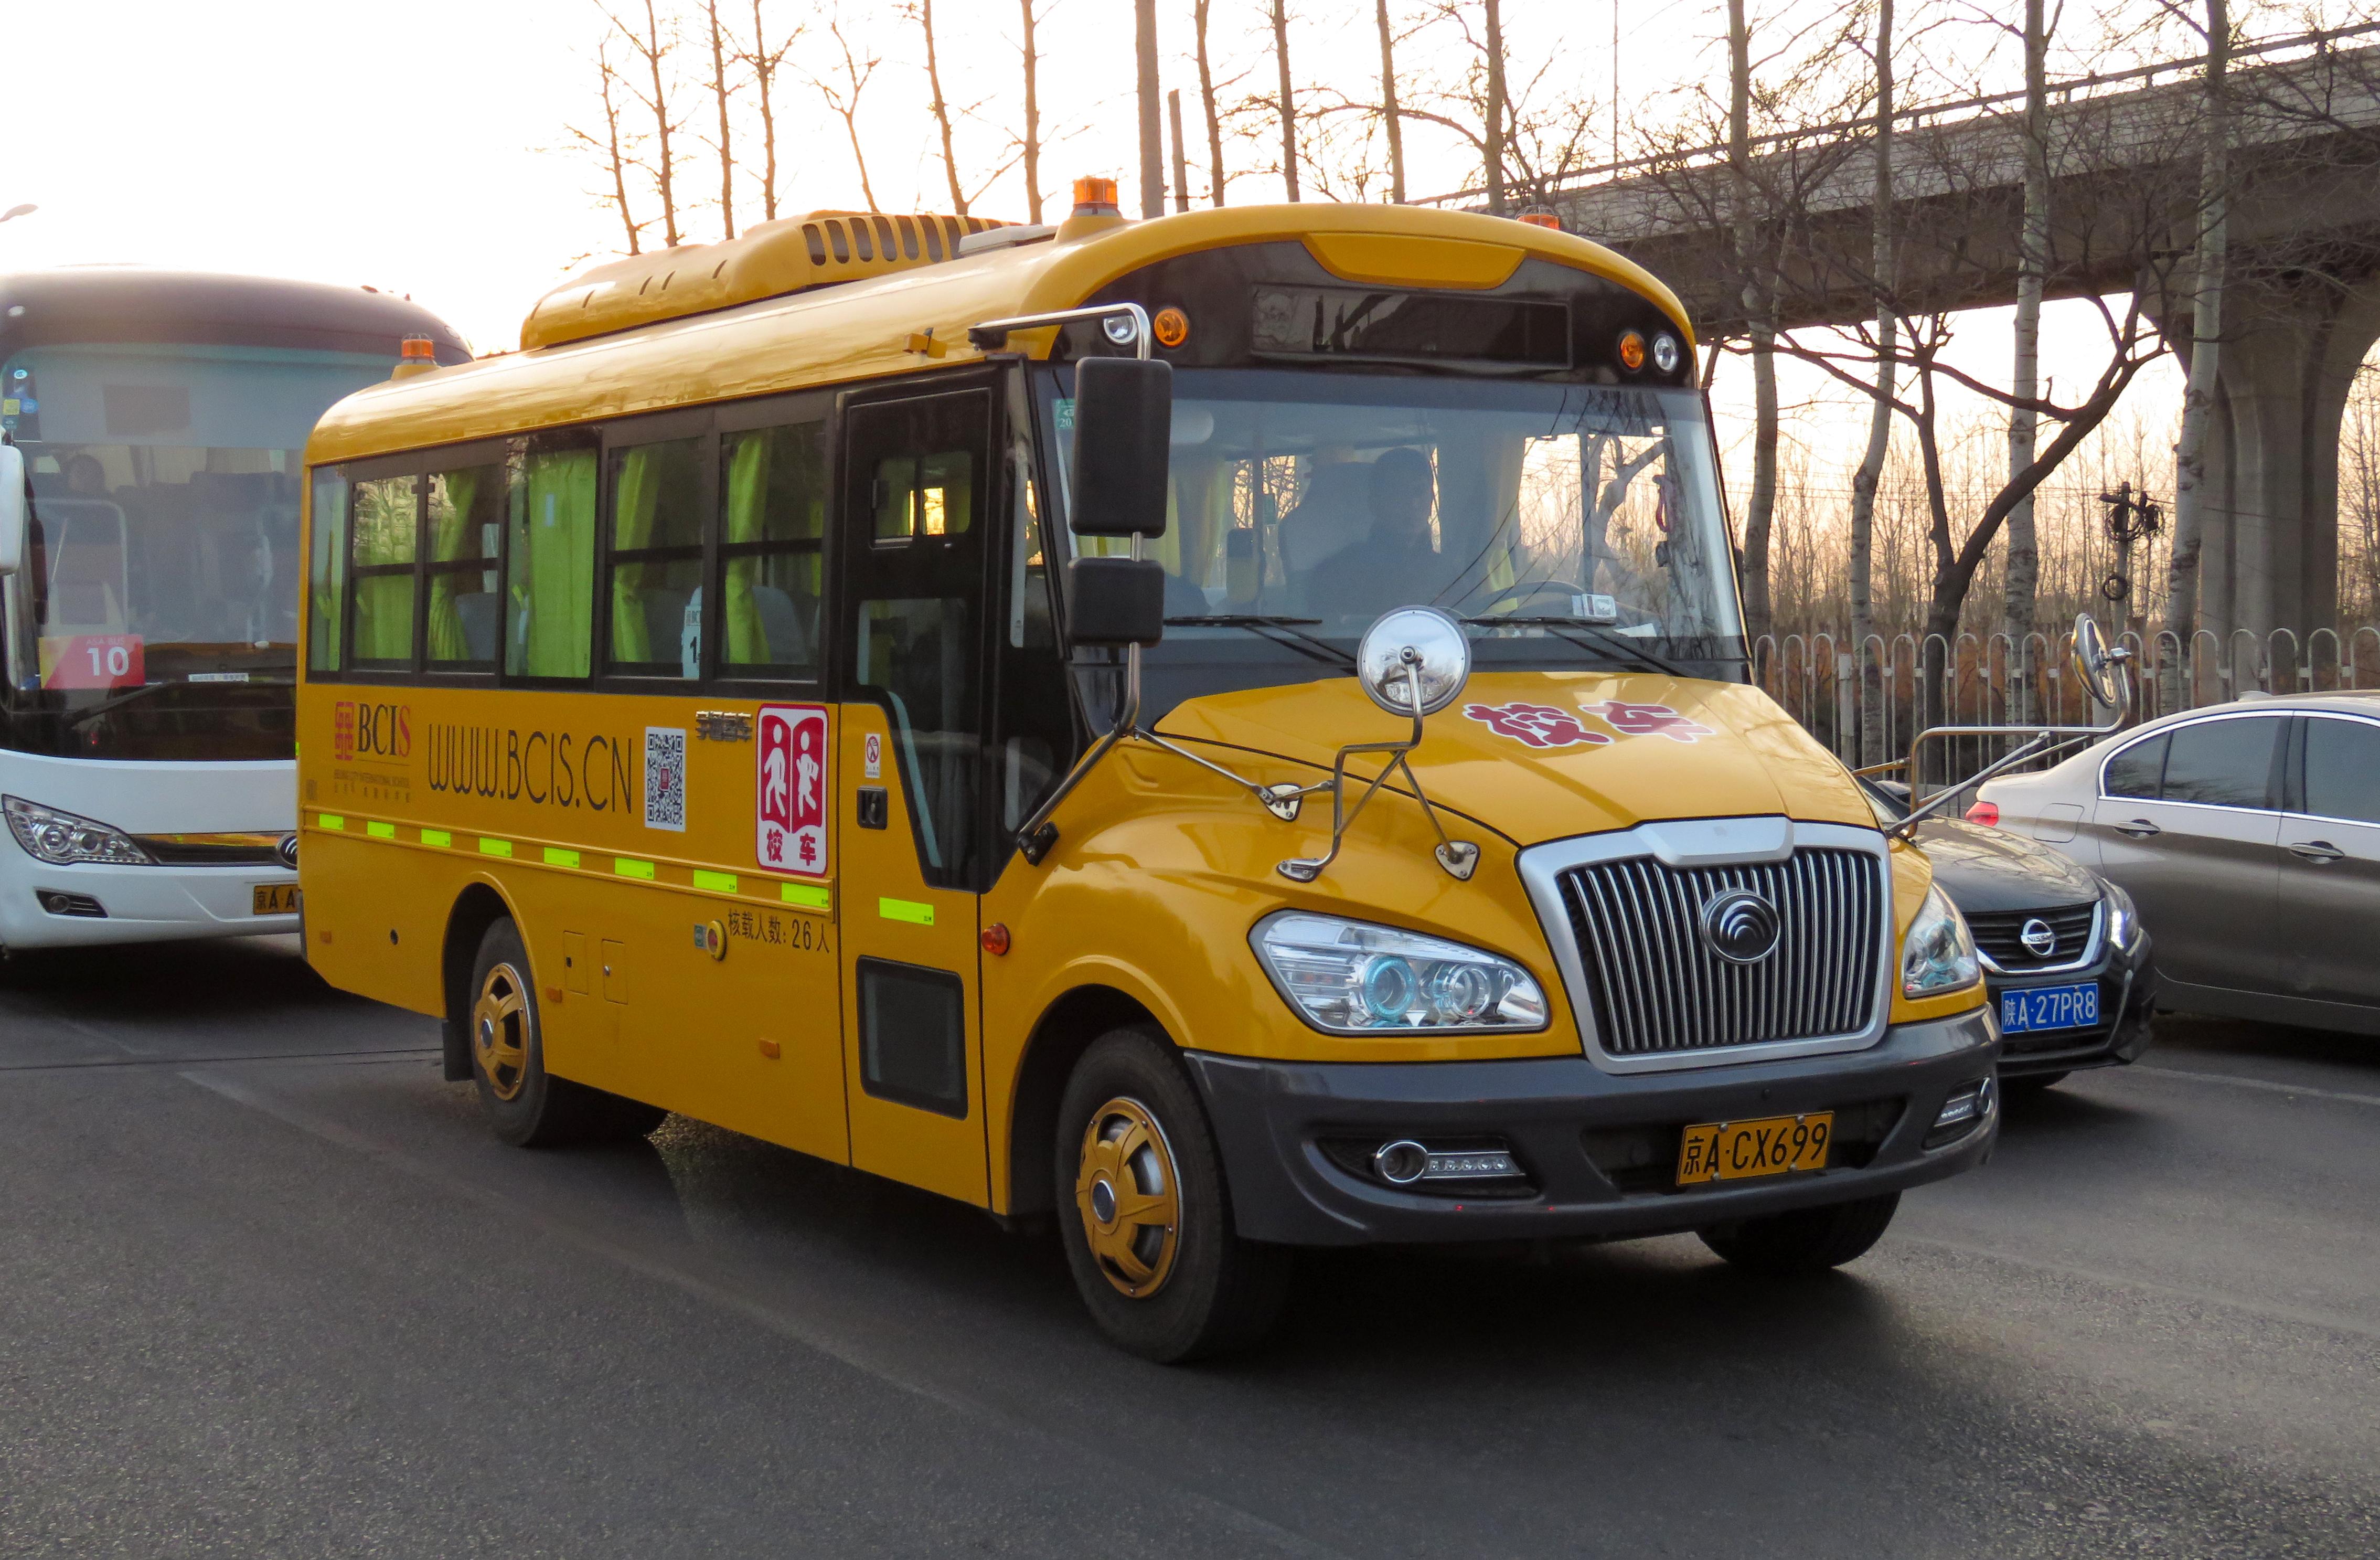 School bus - Wikipedia